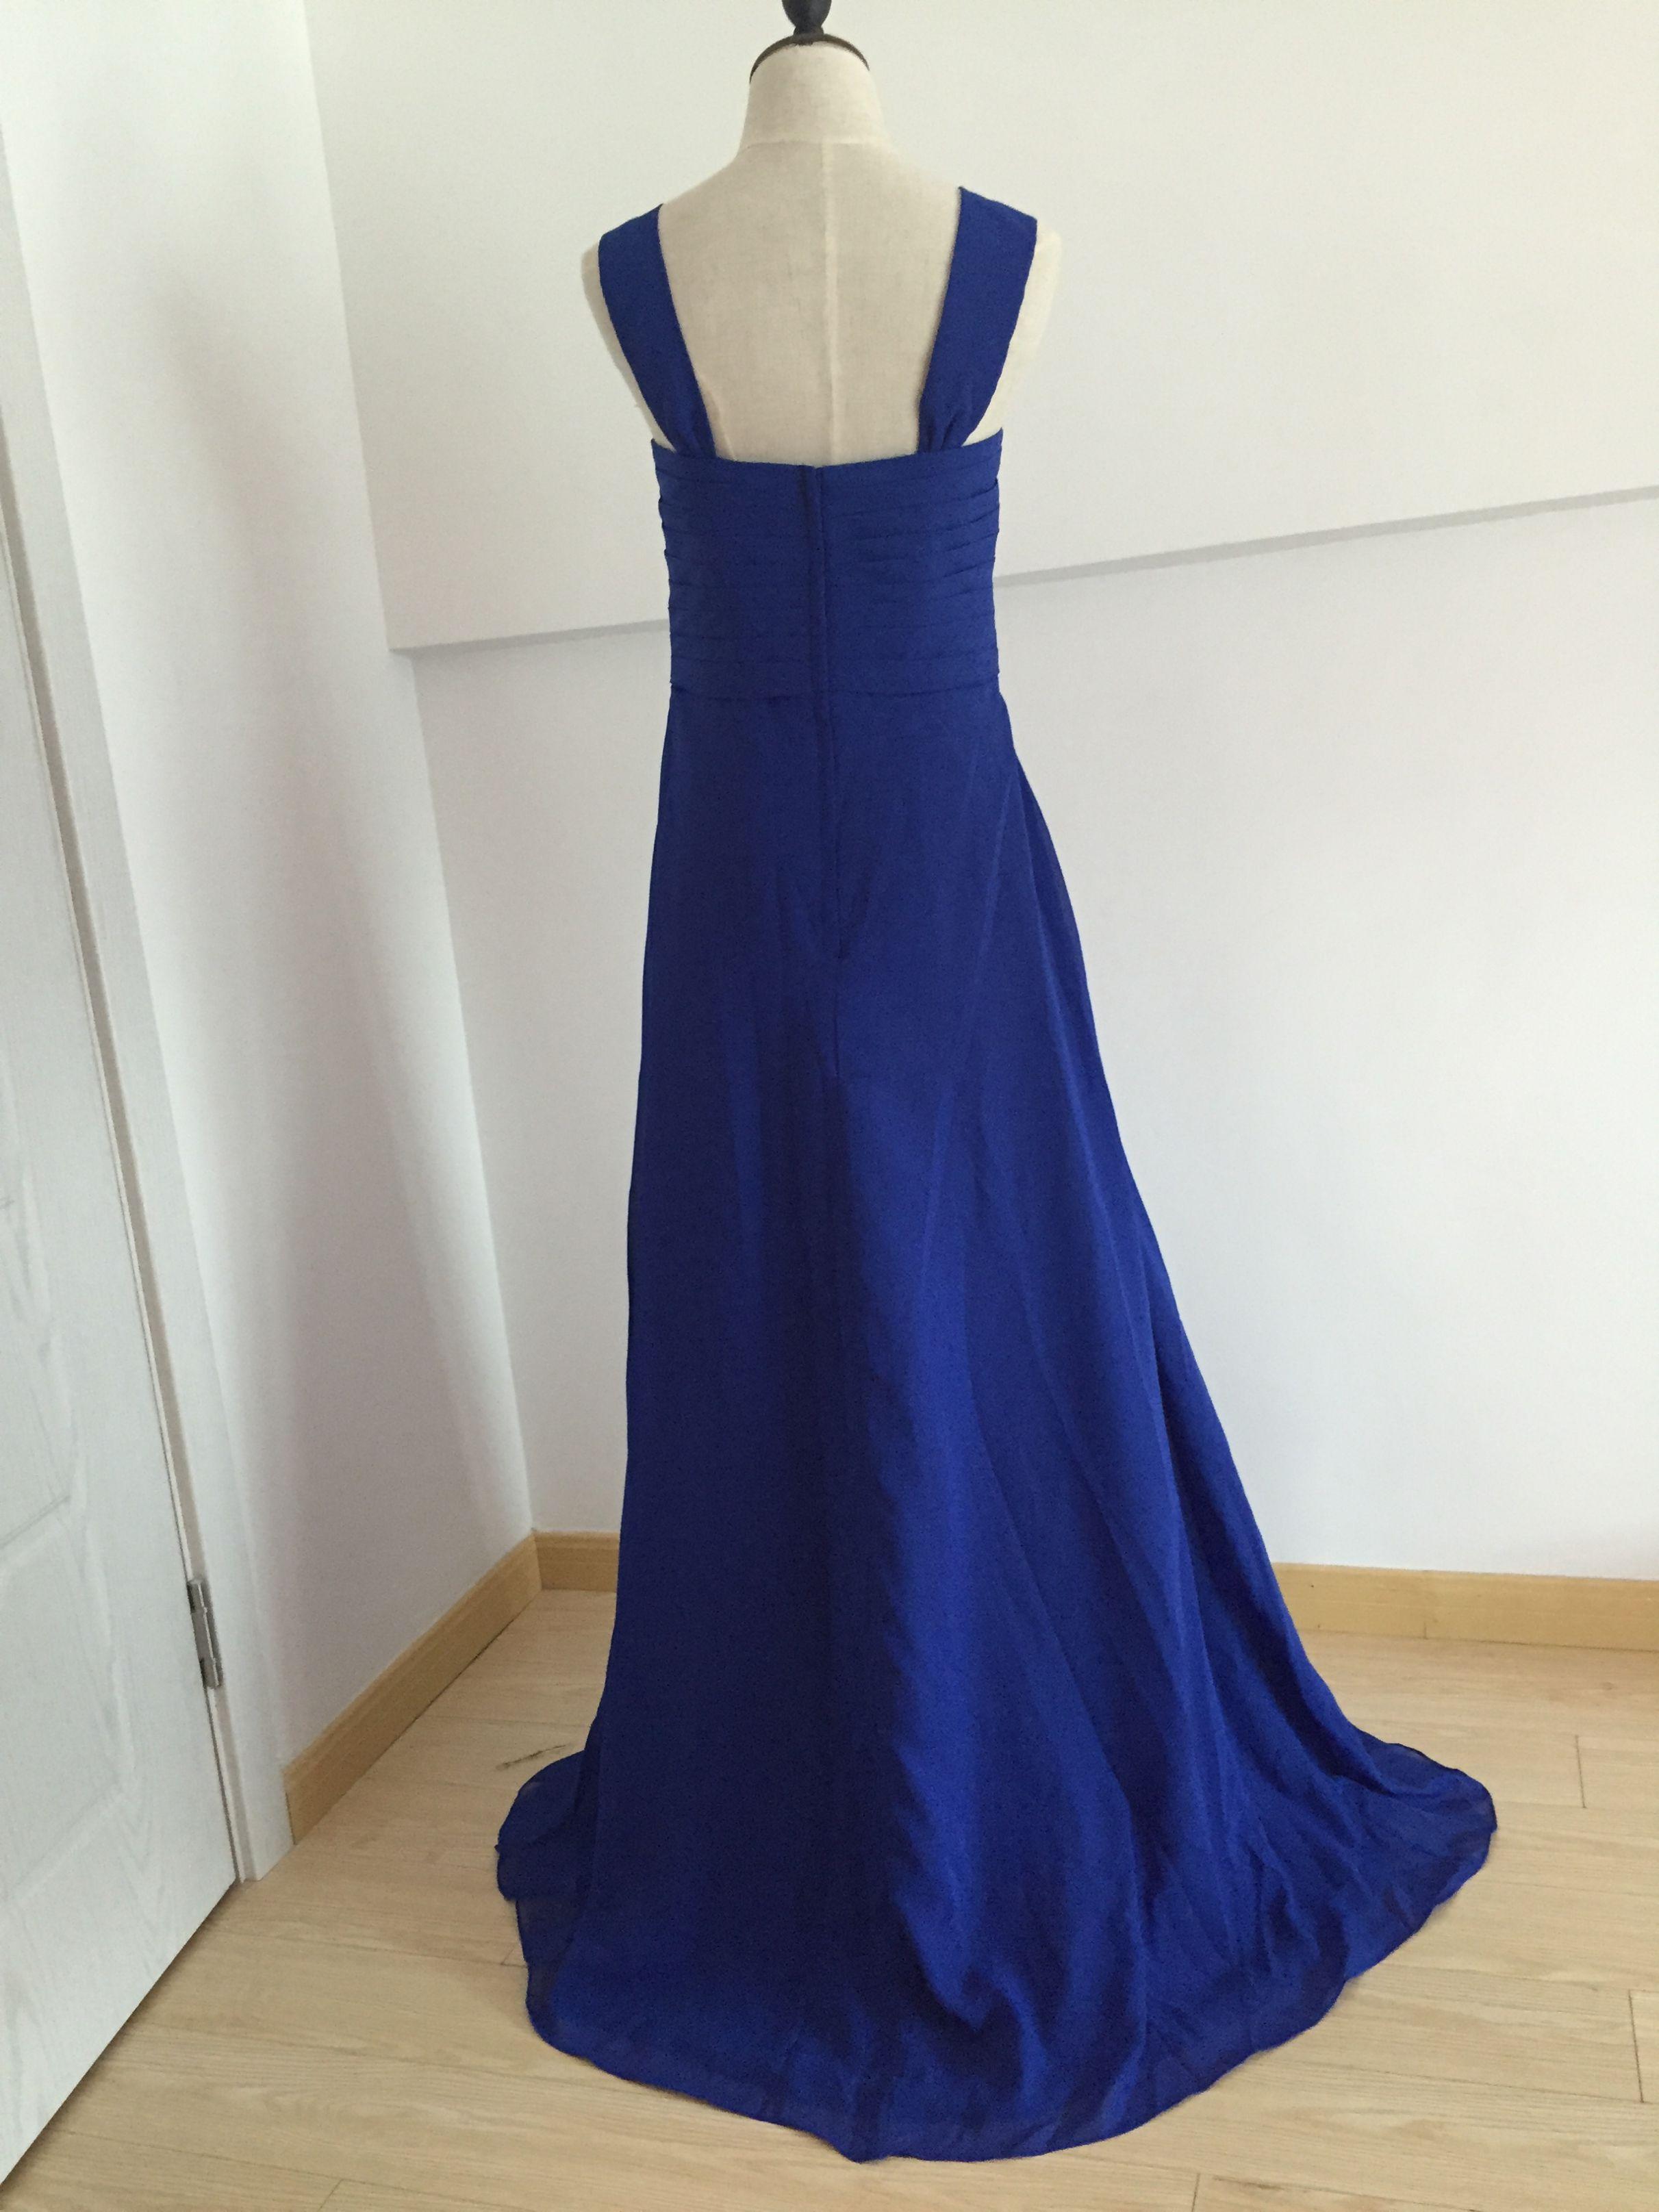 Prom dresses evening dresses long dresses blue prom dresses long